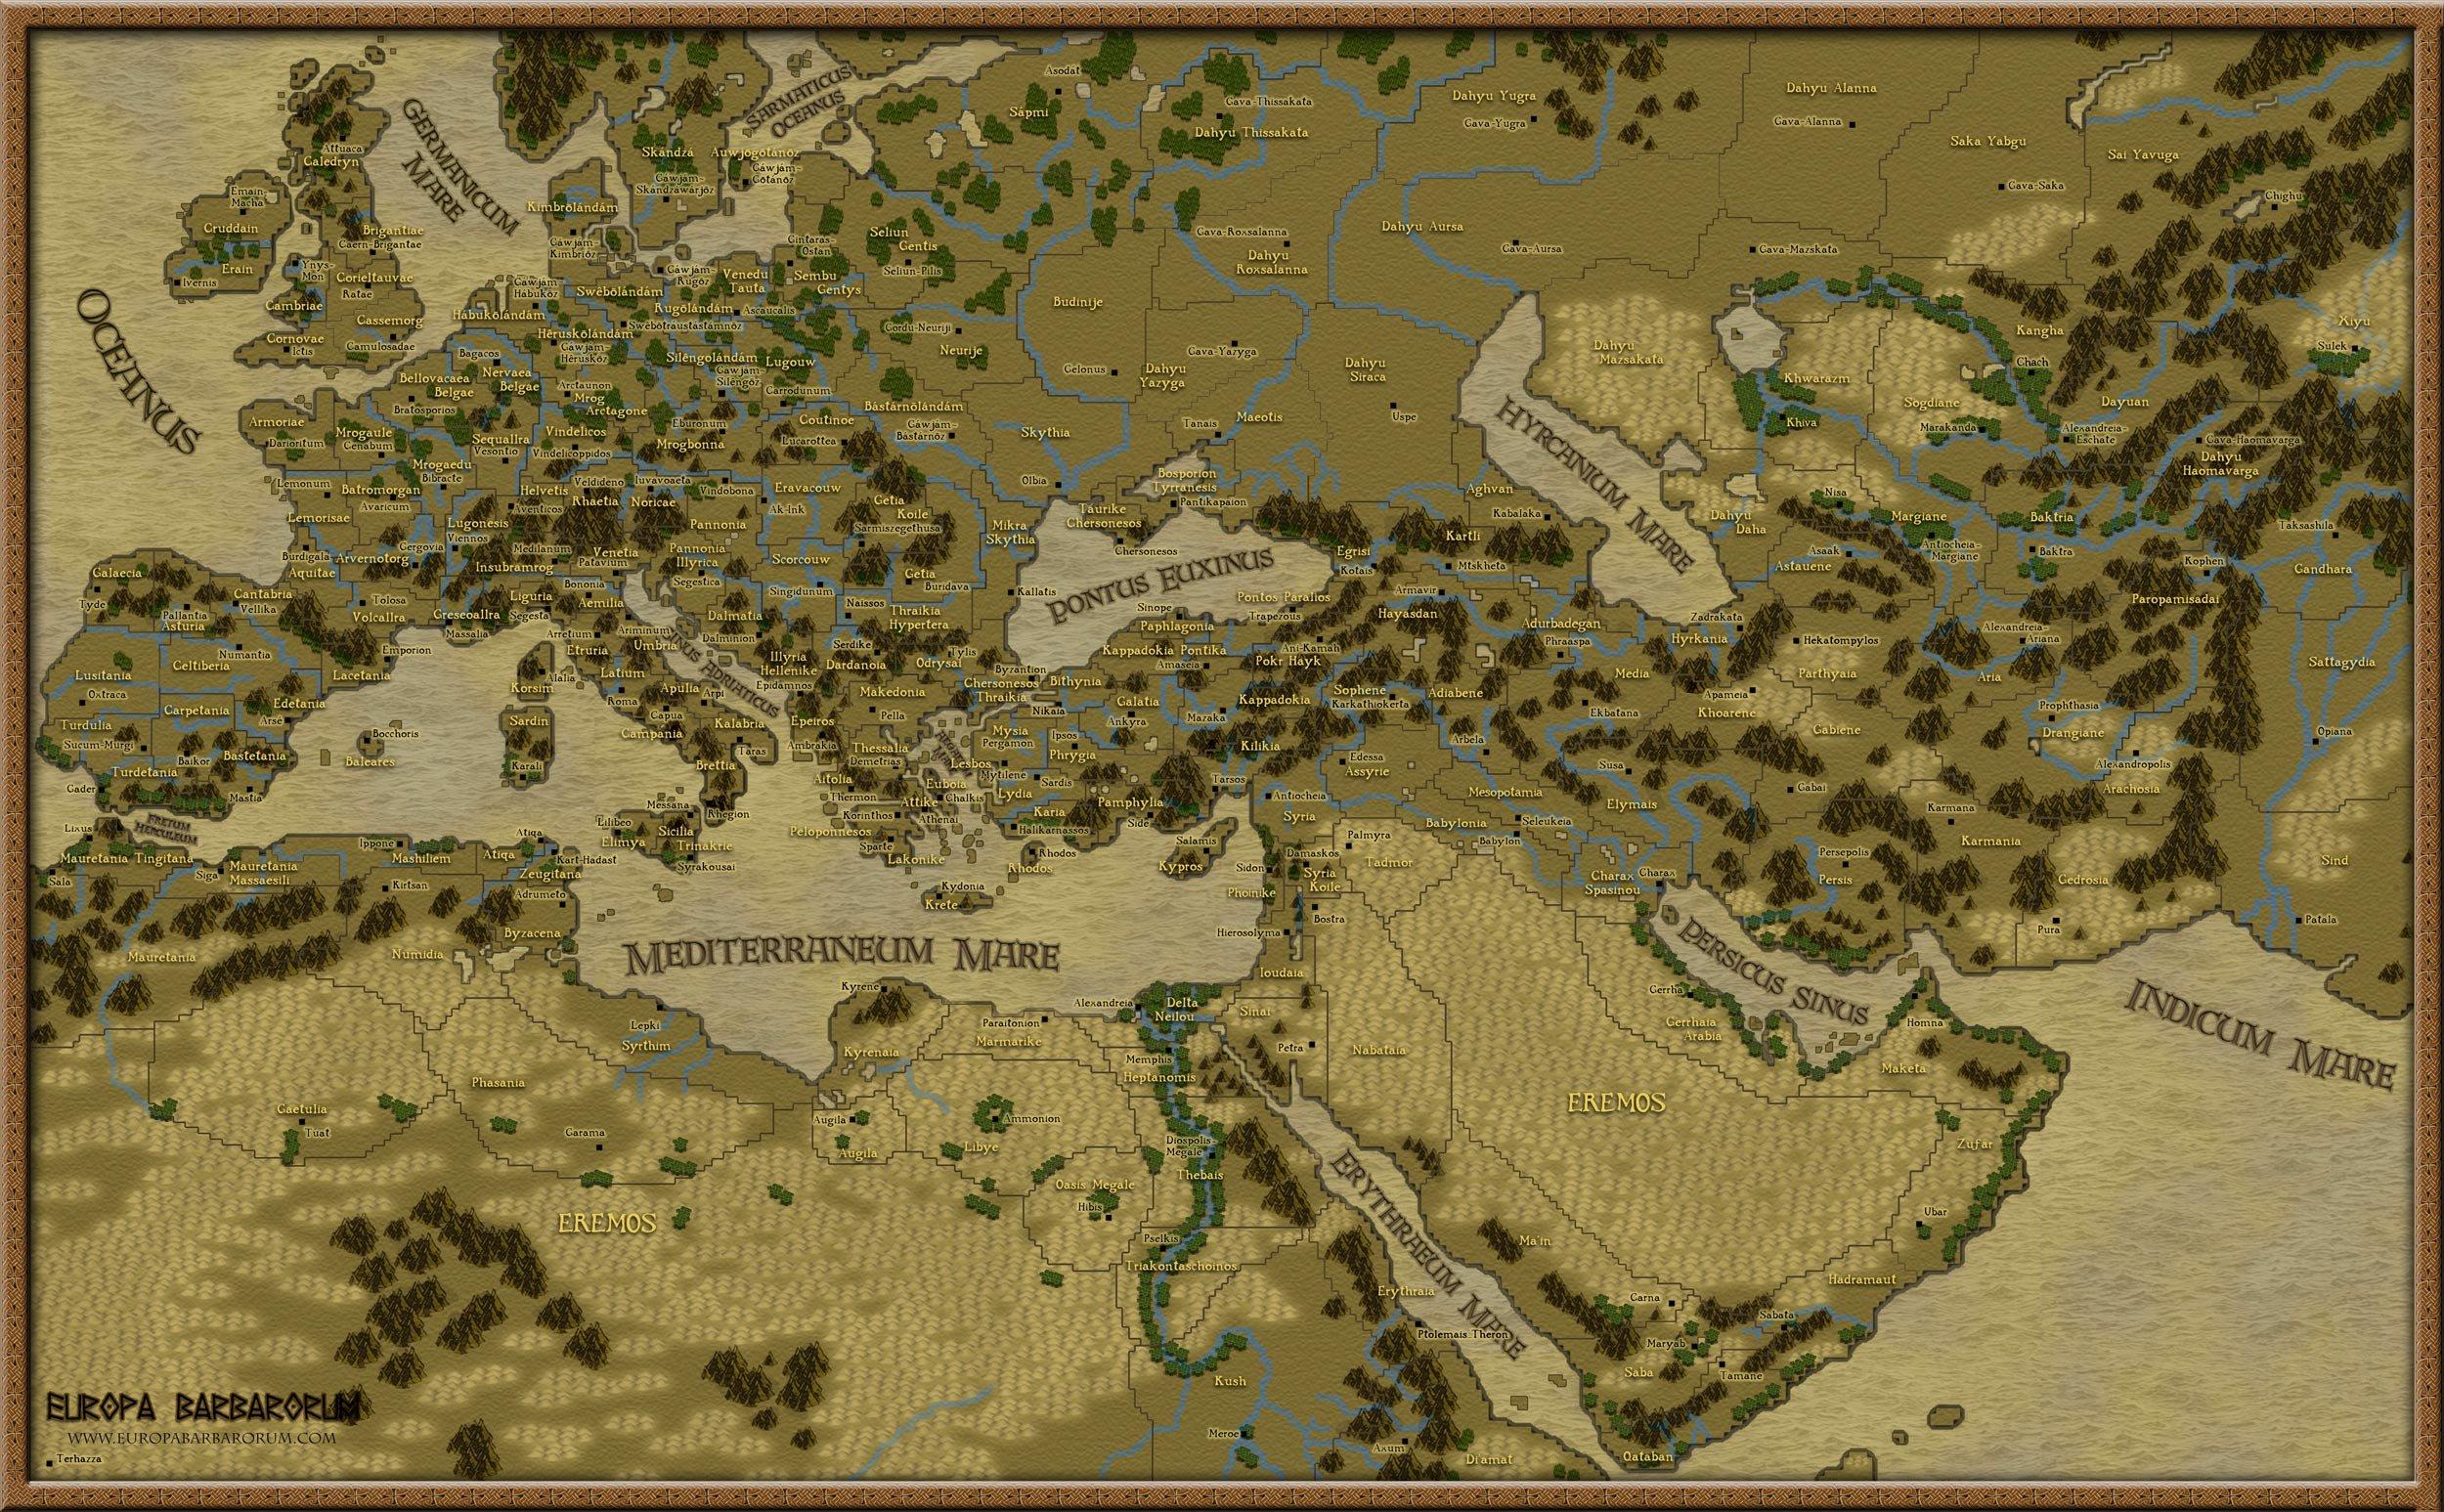 EB-map